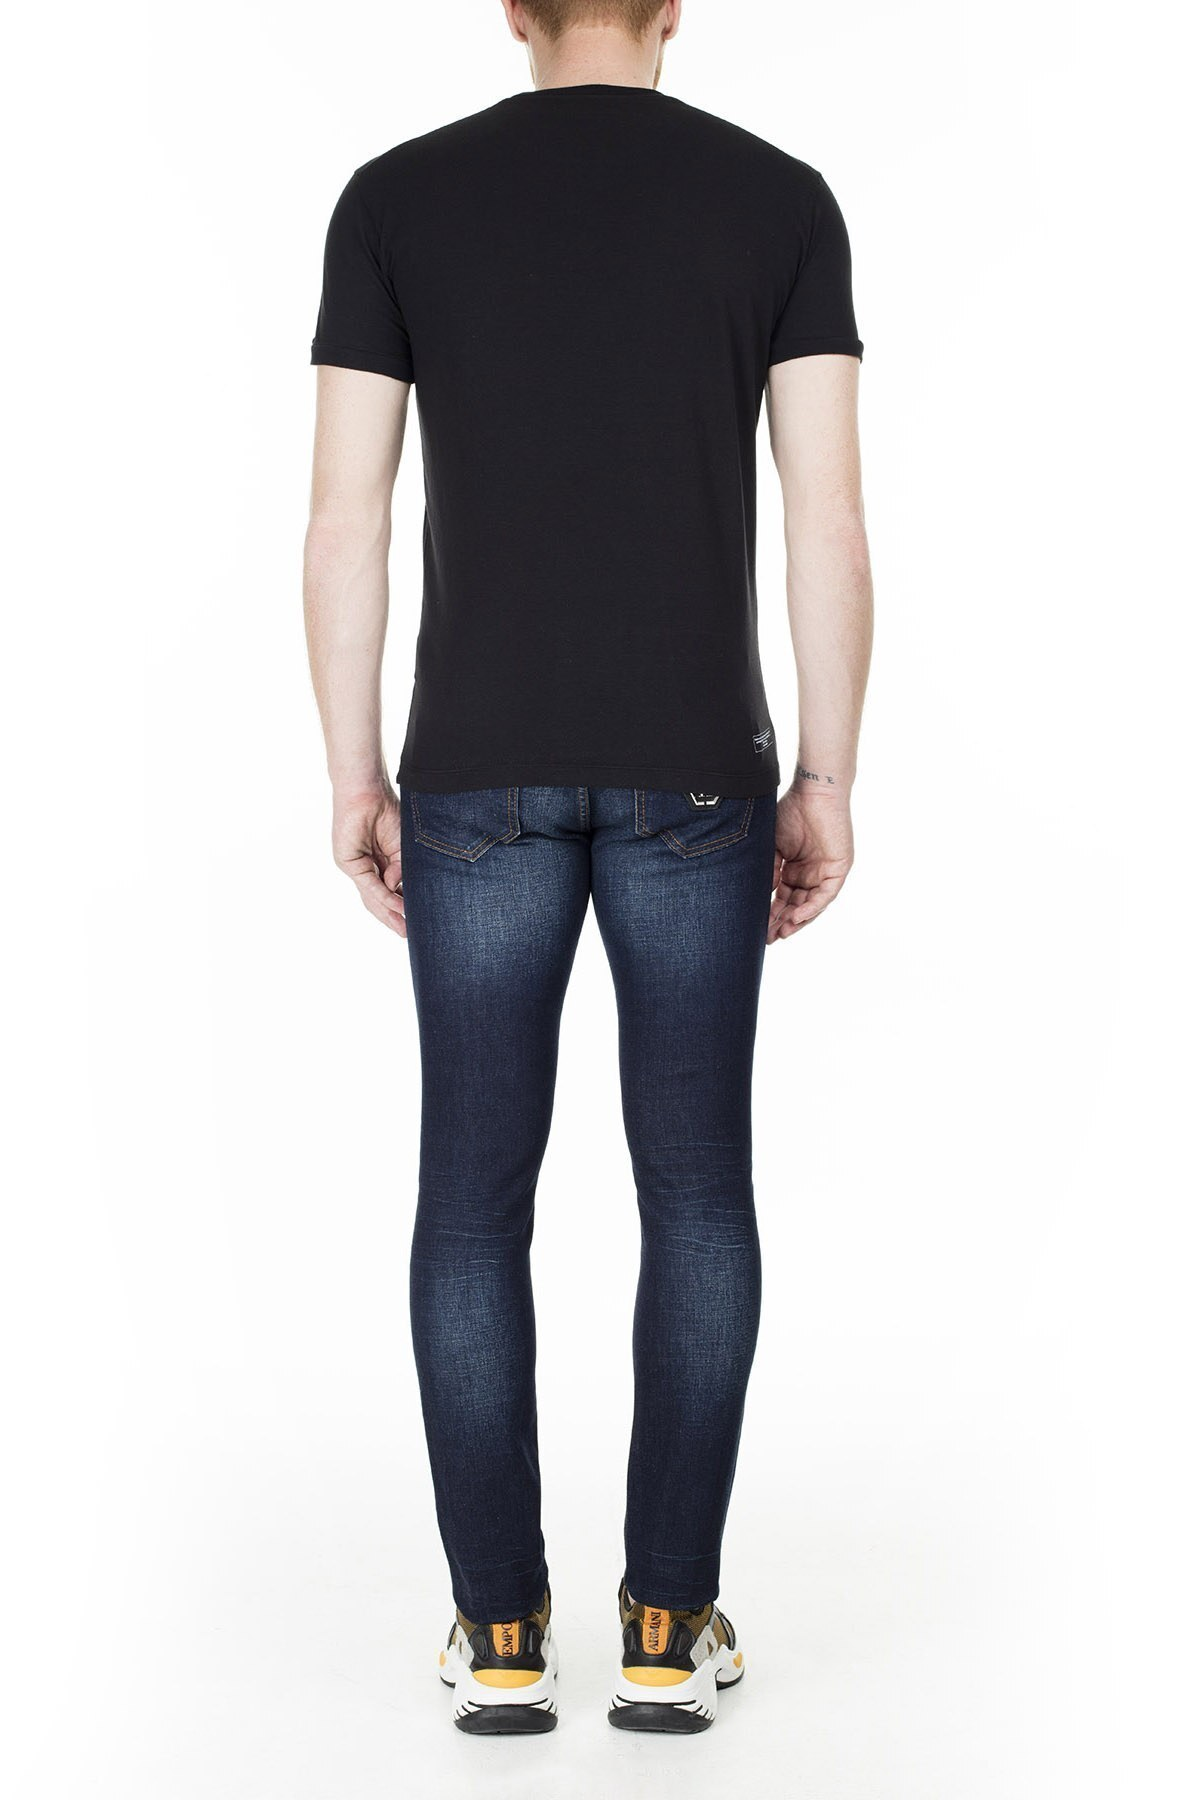 Philipp Plein Slim Fit Jeans Erkek Kot Pantolon P20C MDT2167 PDE004N 14CR LACİVERT